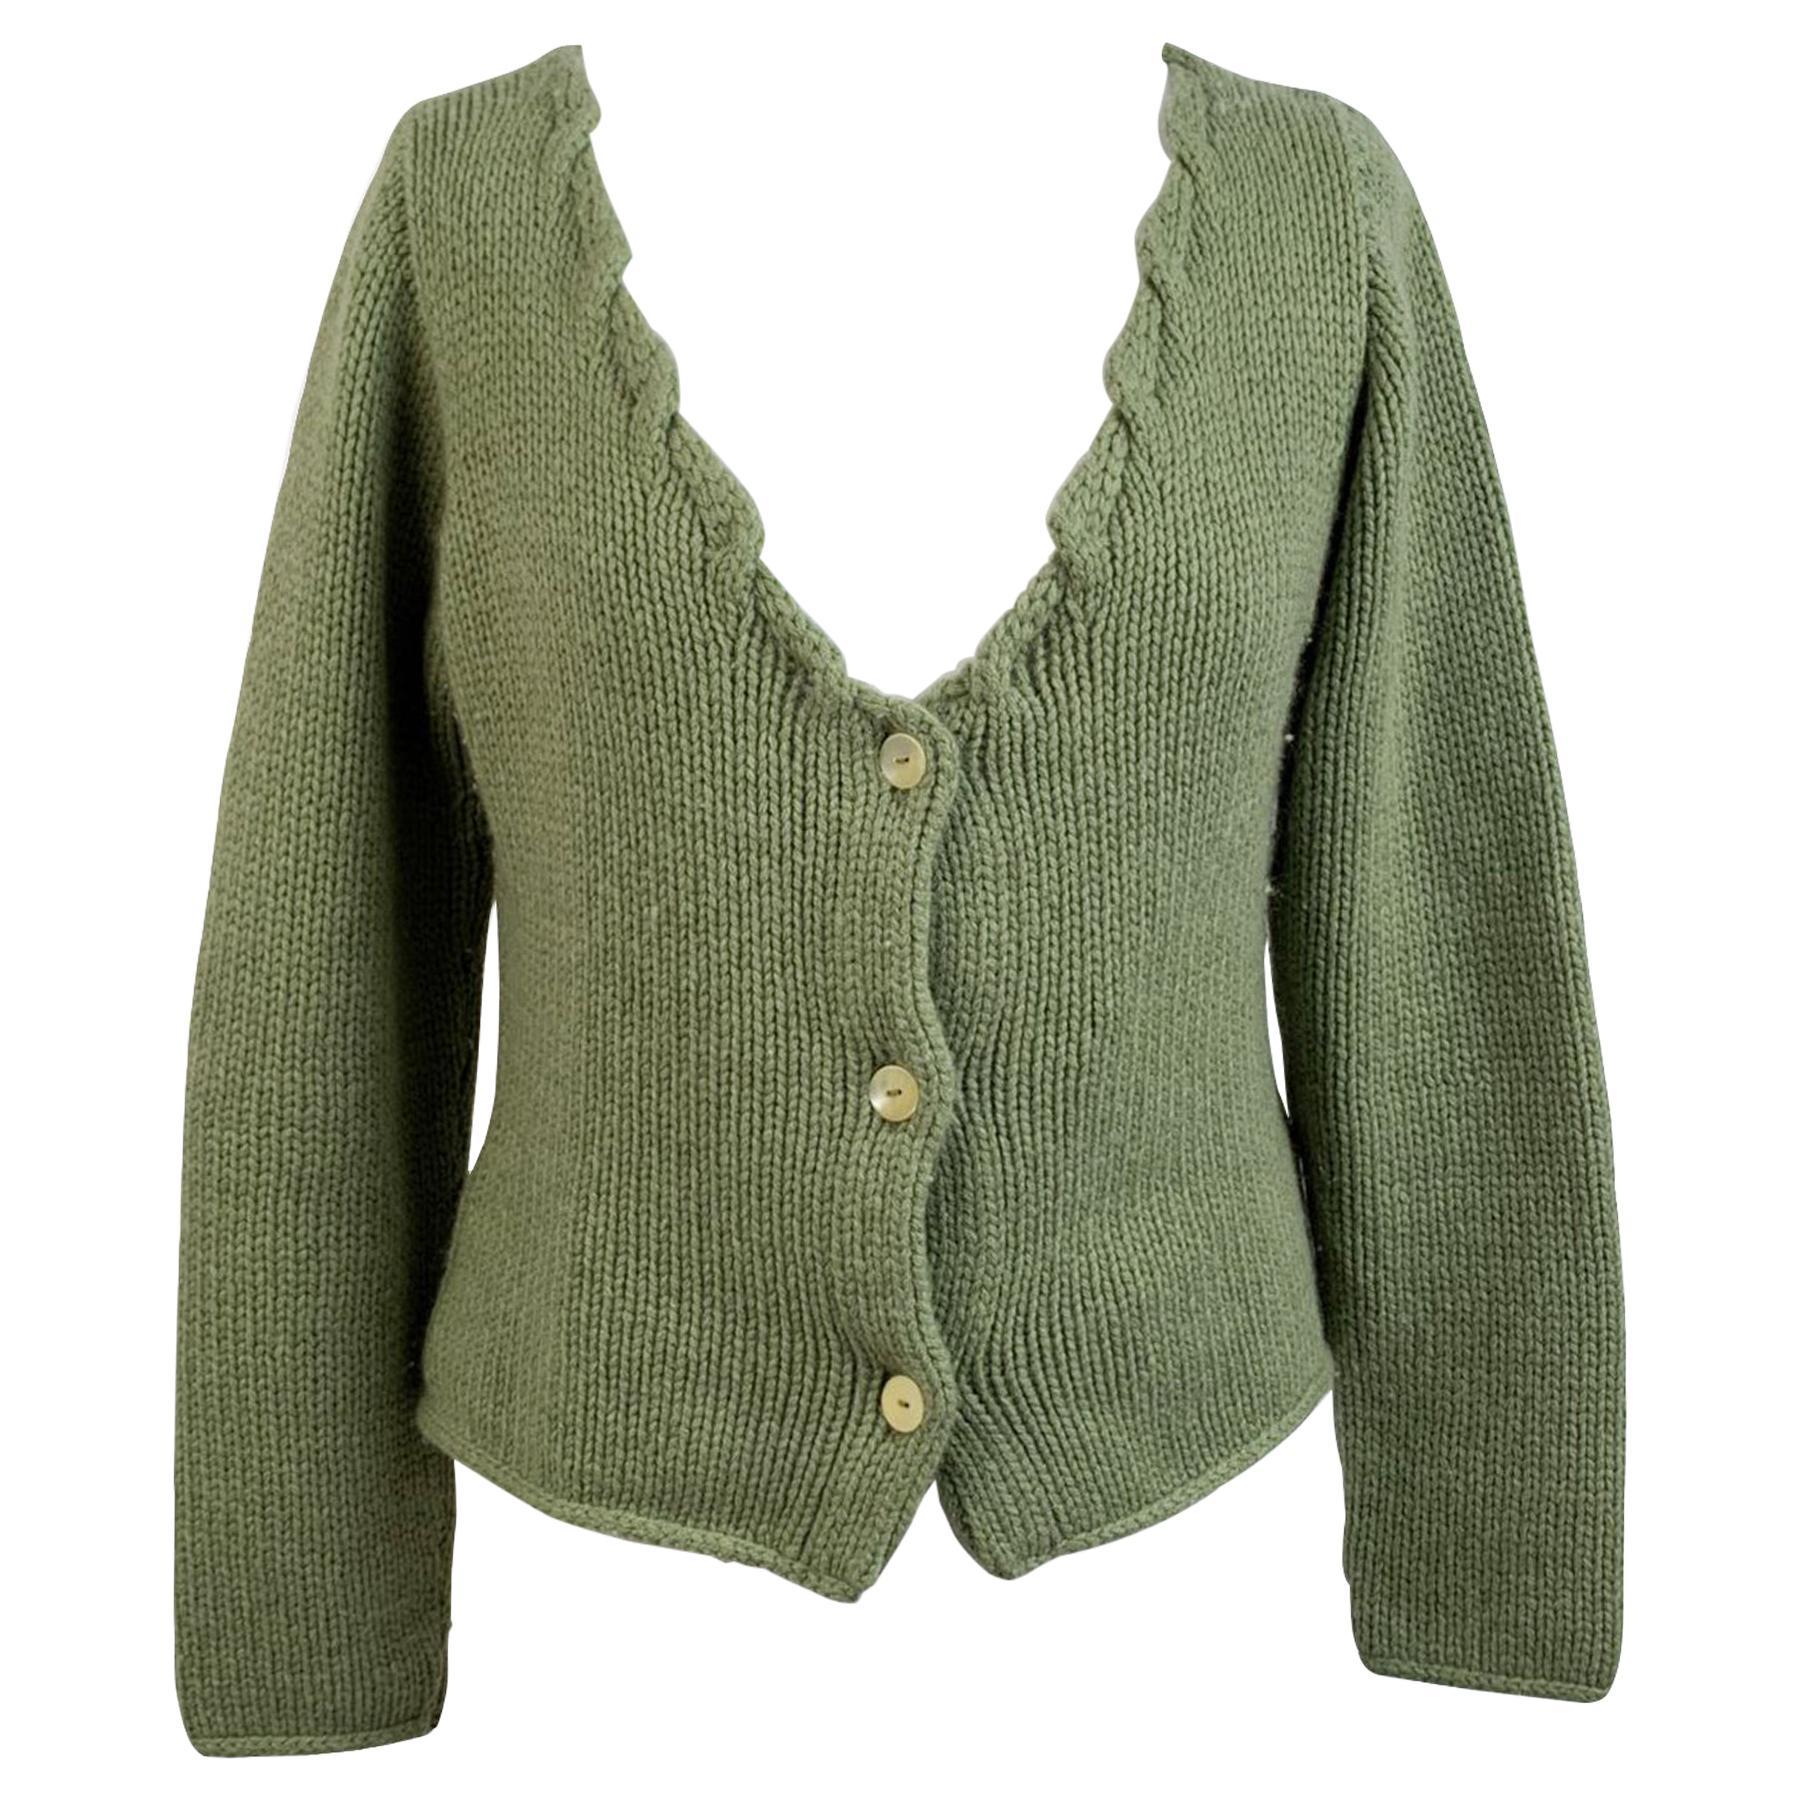 Ermanno Daelli Vintage Green Cashmere Sweater Cardigan Size S